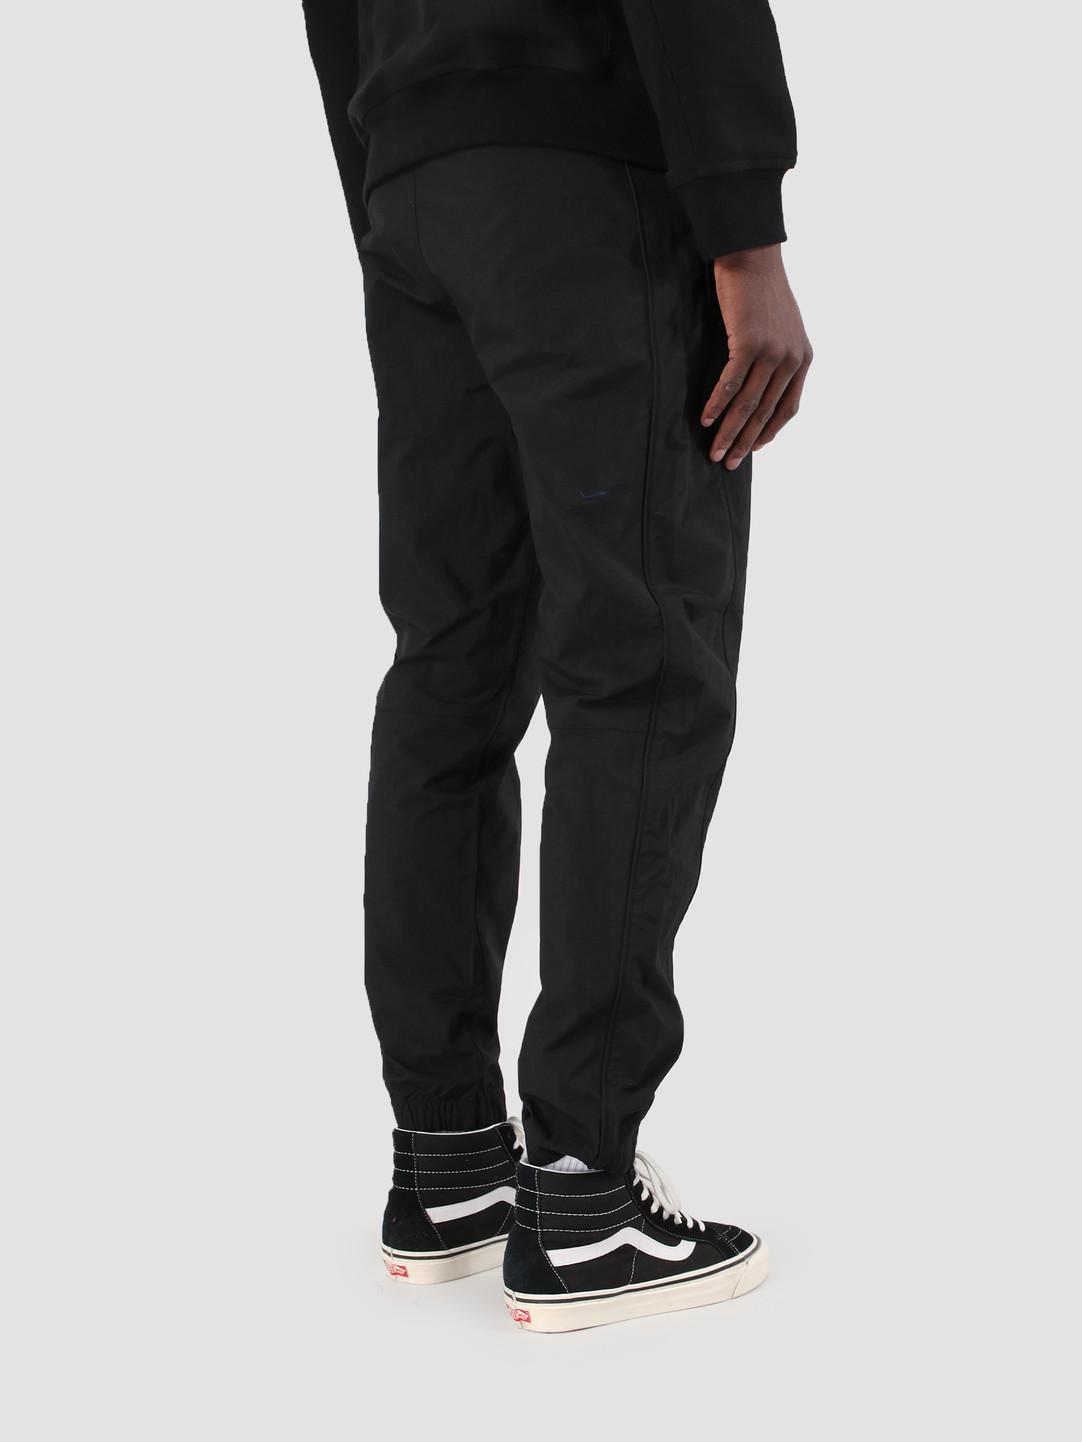 Carhartt WIP Carhartt WIP Casper Pant Black I026326